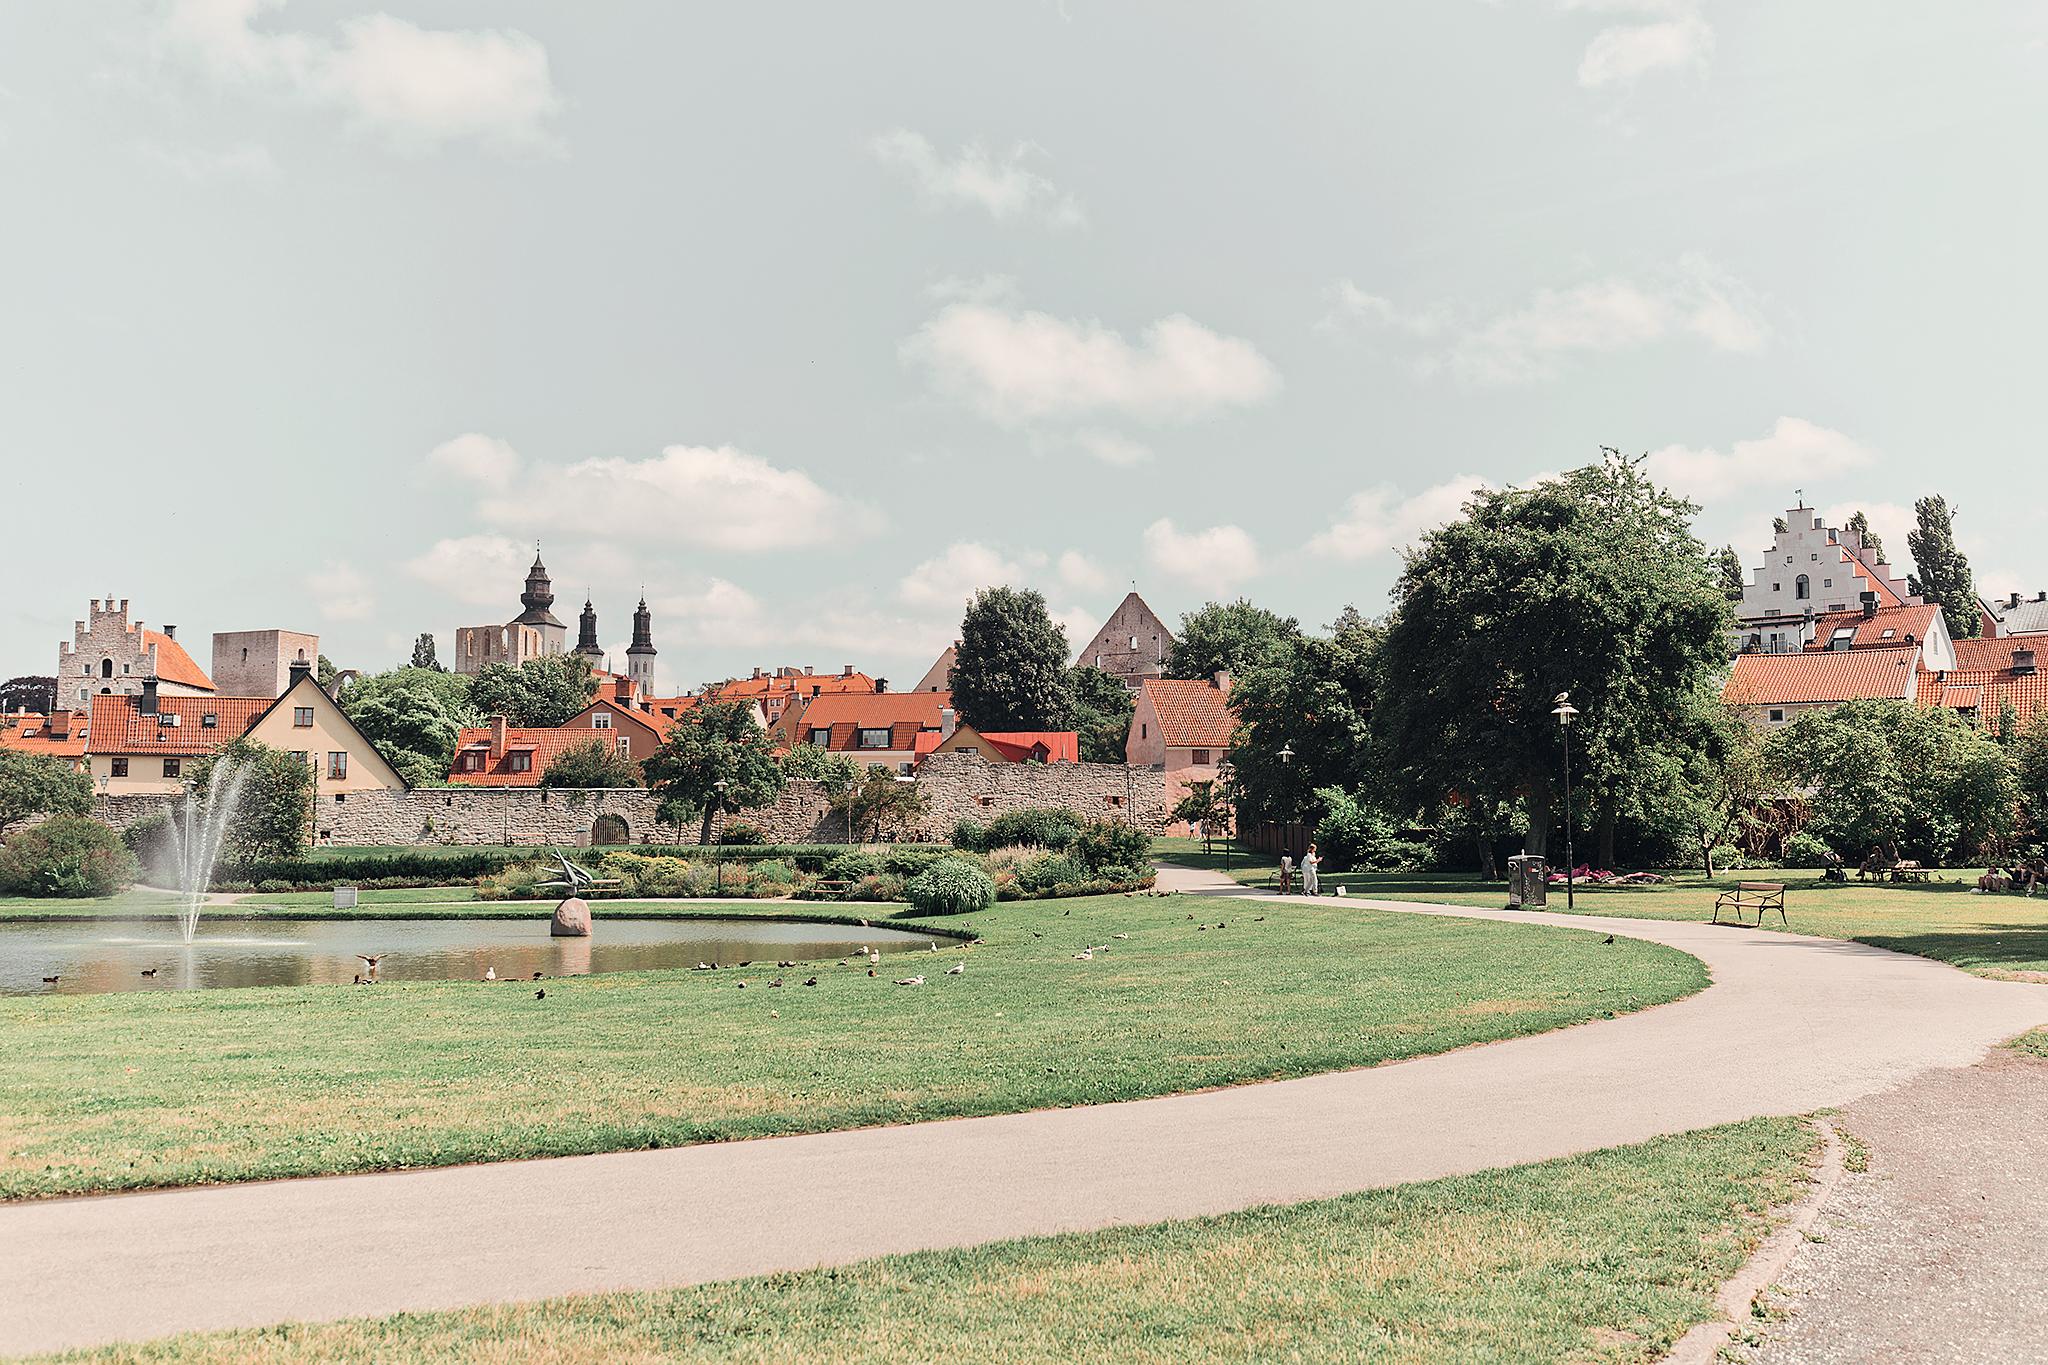 Resedagbok Gotland: Almedalen